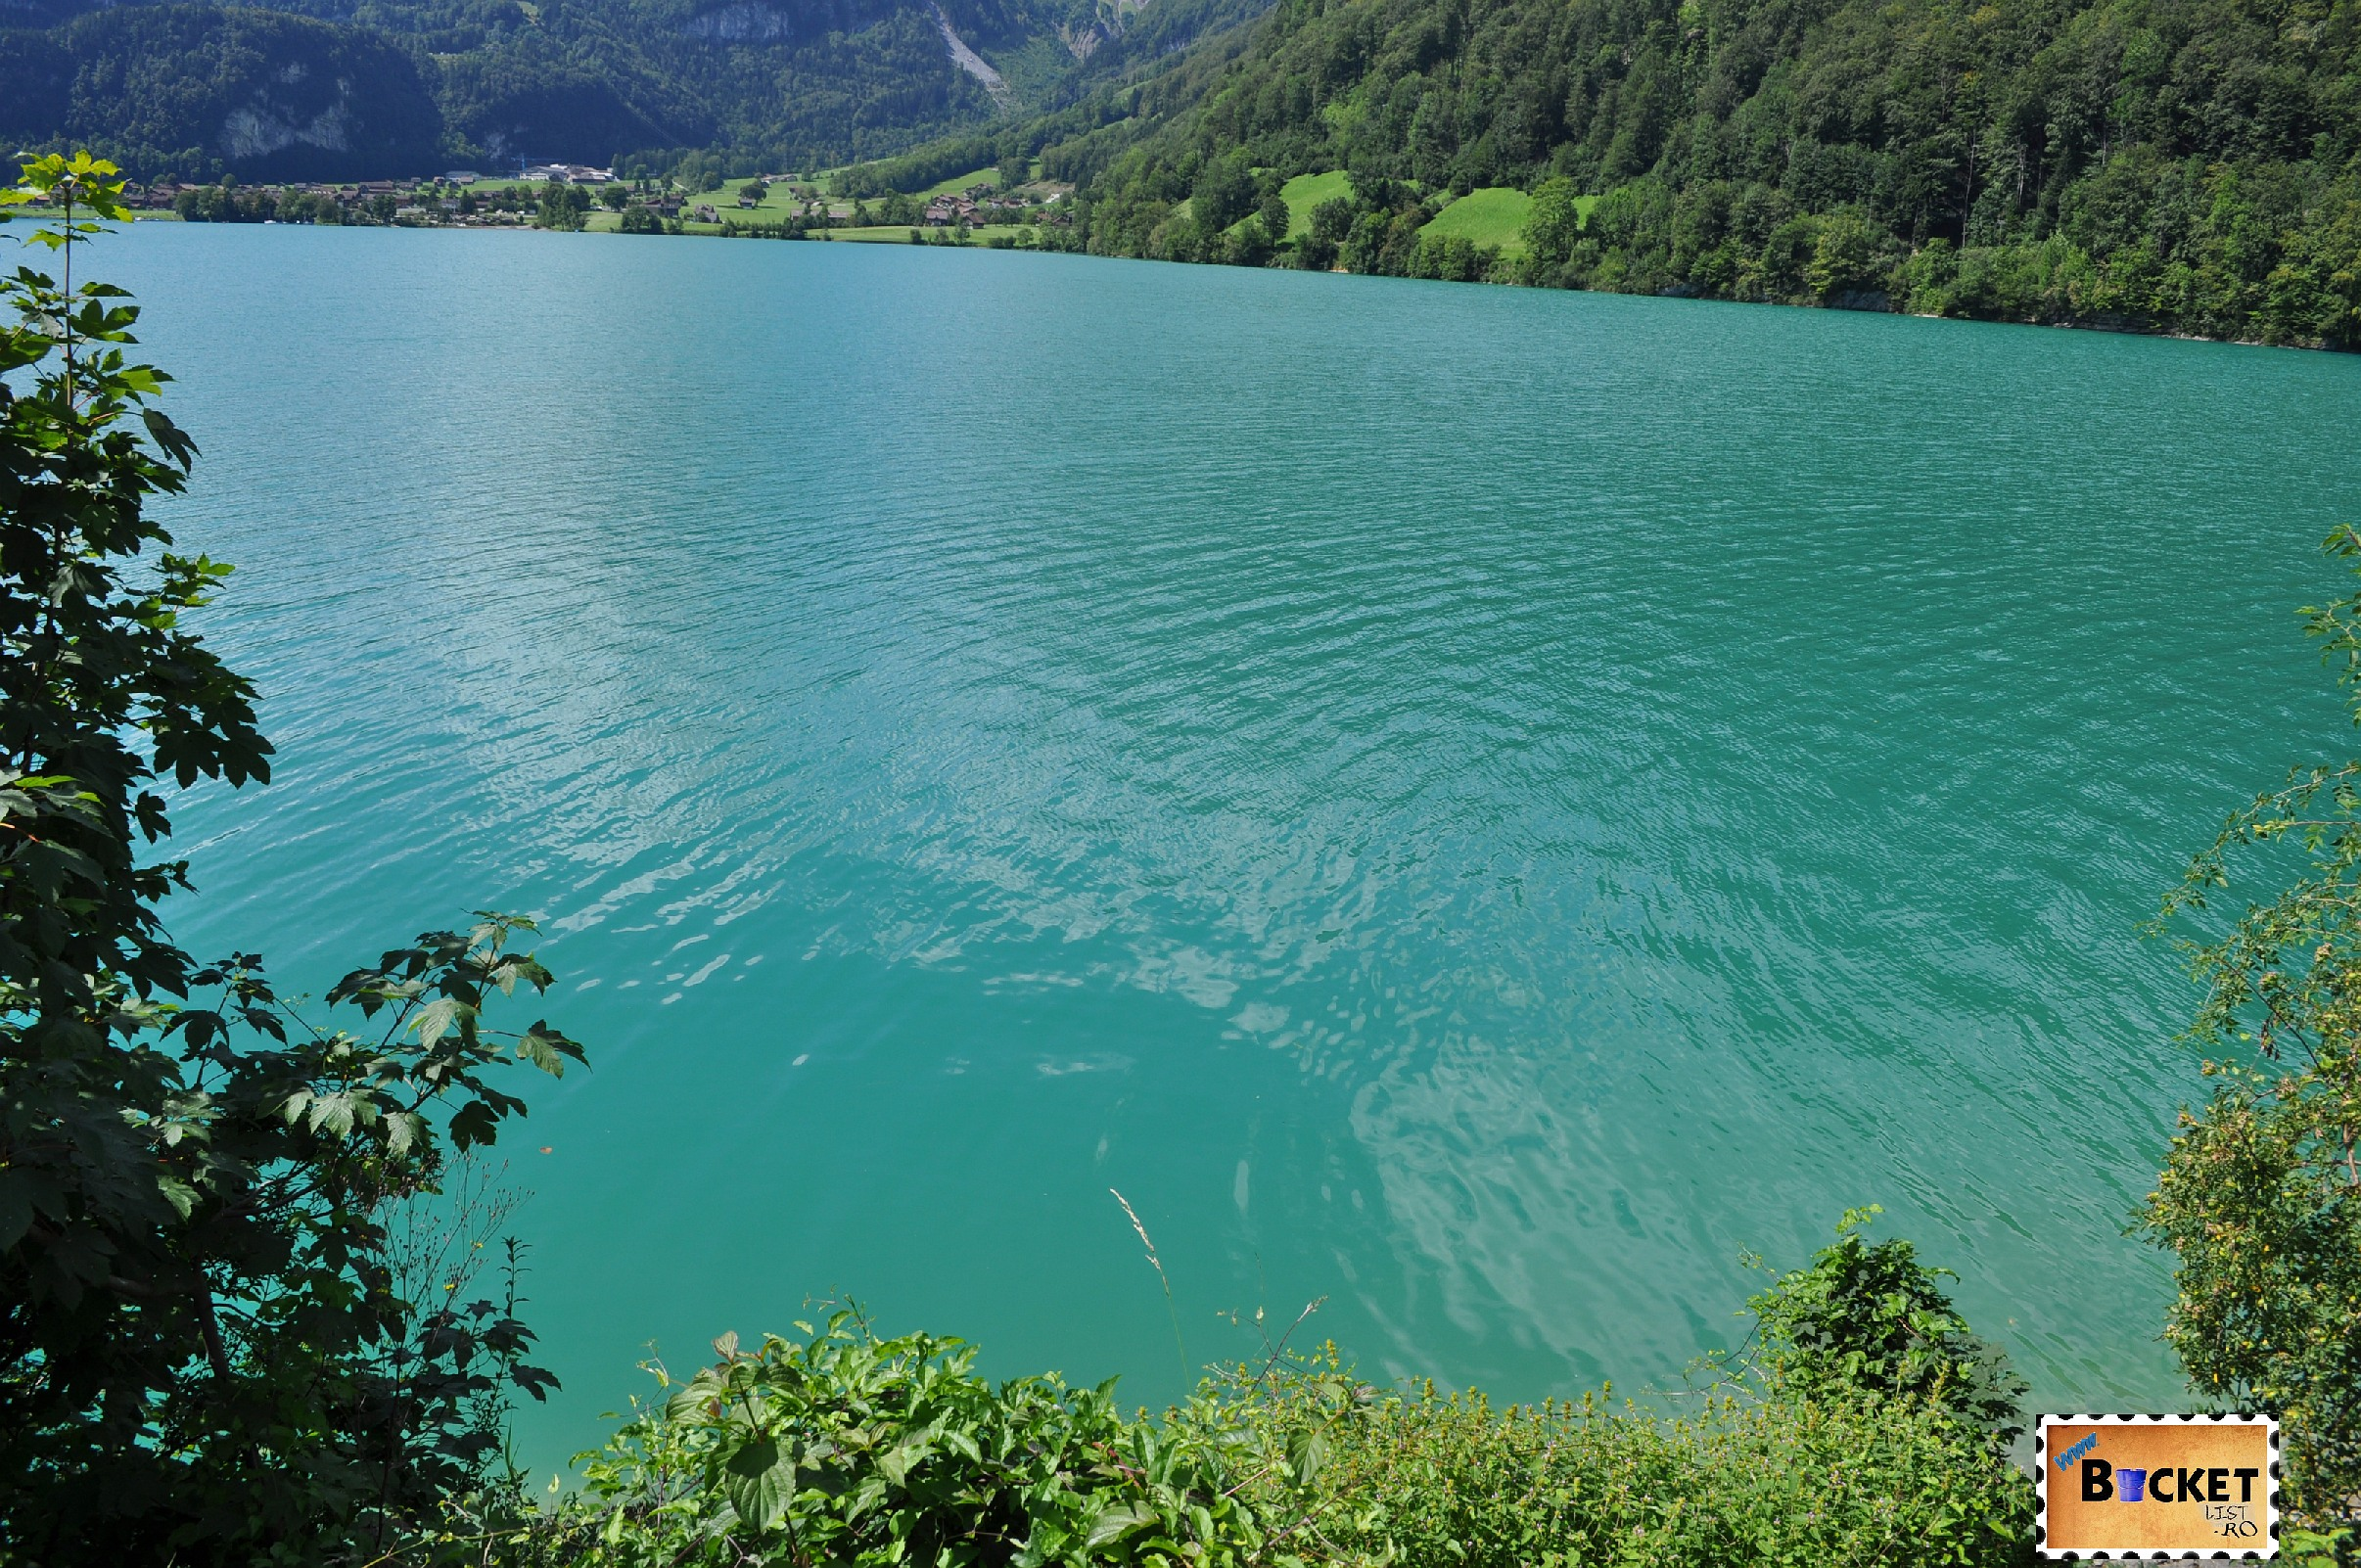 Samensee (Lacul Samen vazut pe vreme insorita)